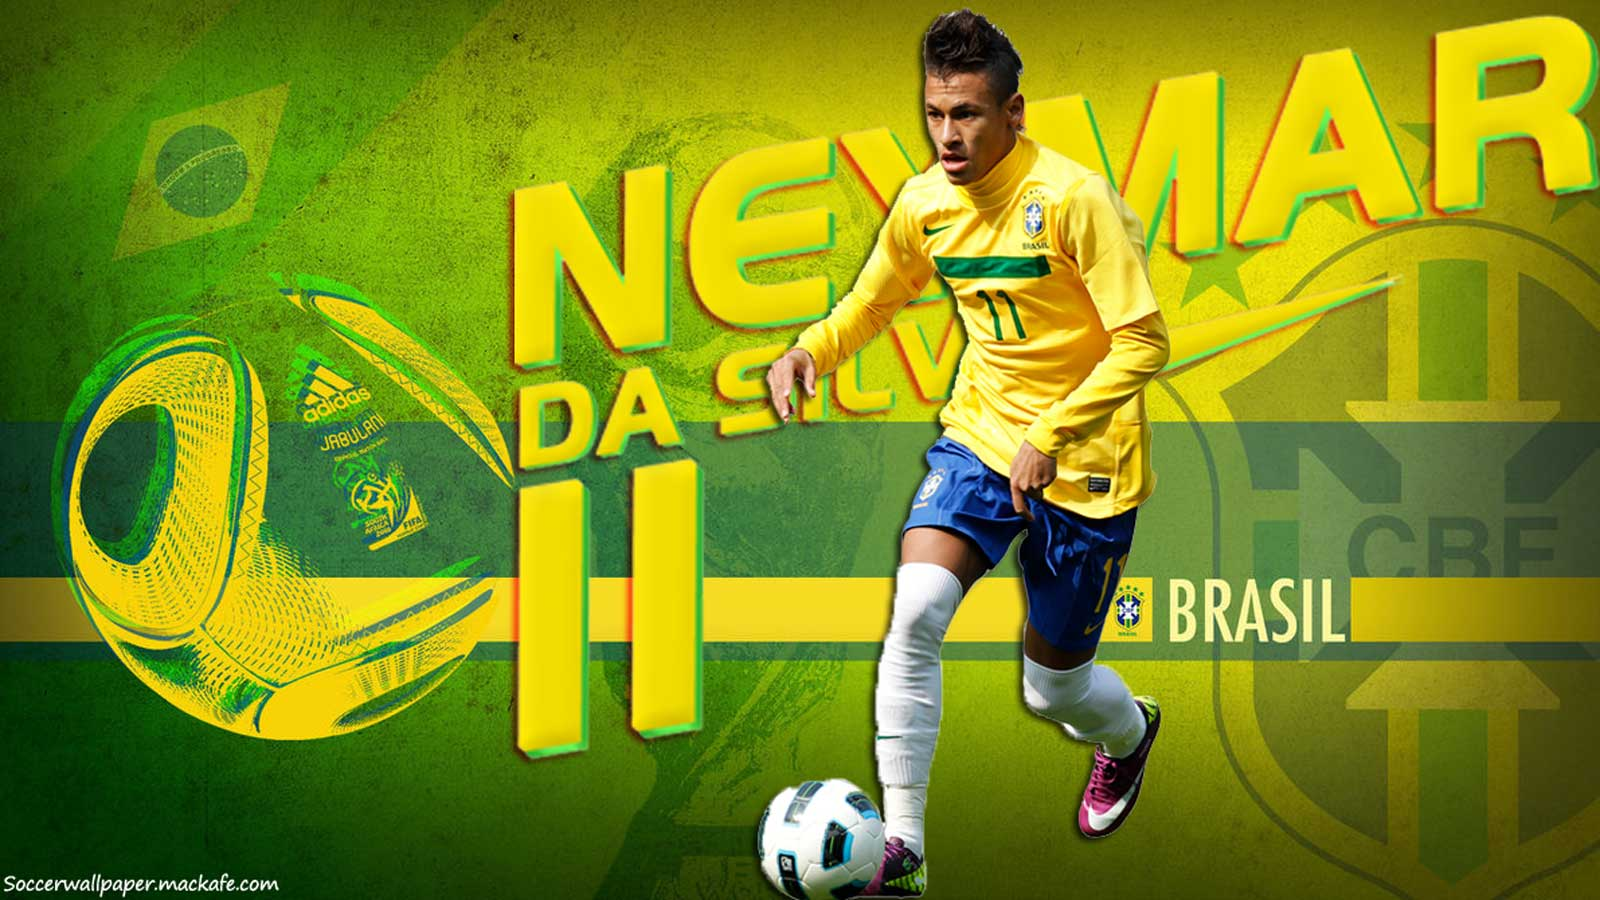 Hd wallpaper neymar - Wallpapers Neymar Hd Wallpapers Neymar Hd Wallpapers Neymar Hd